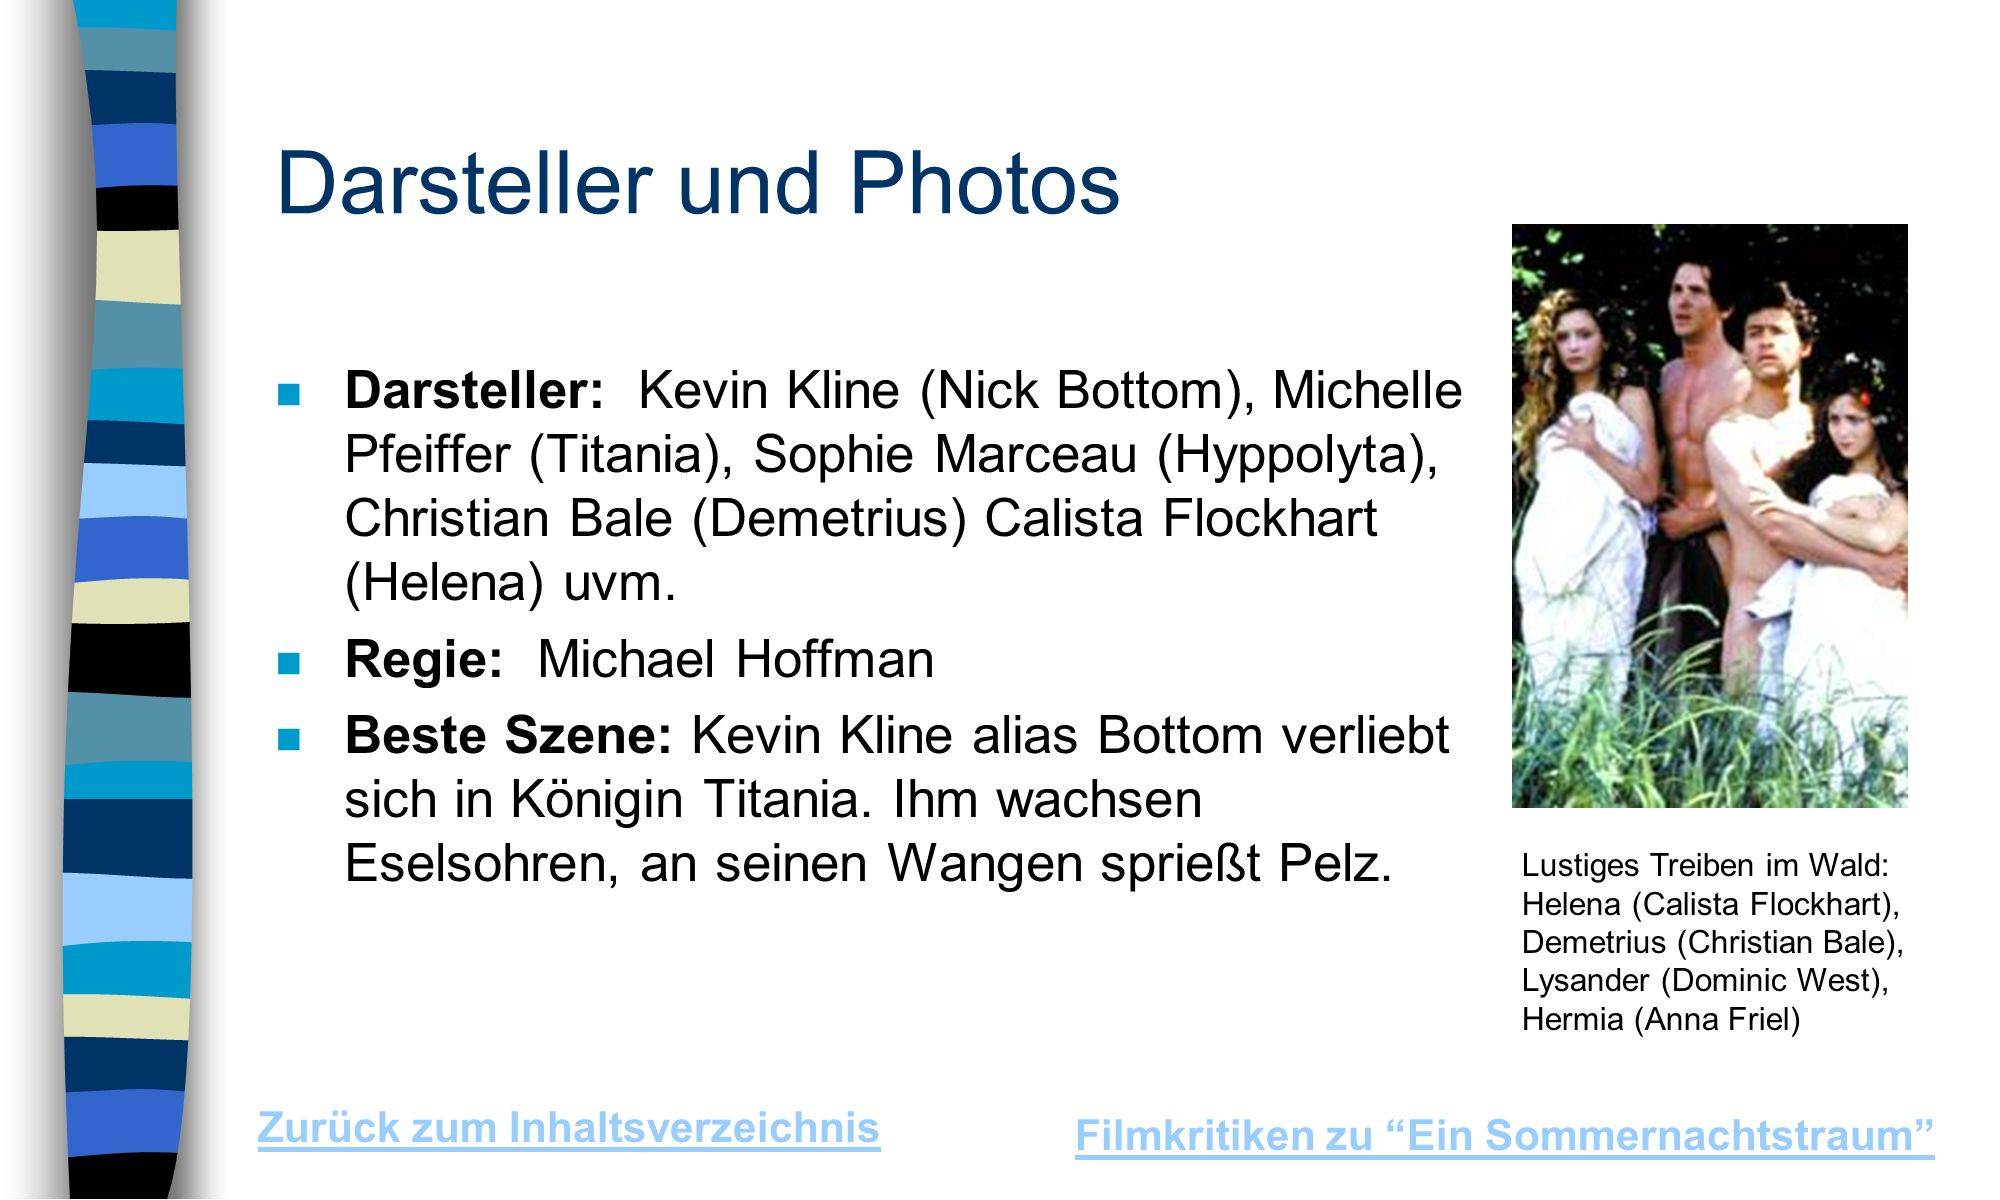 Darsteller und Photos n Darsteller: Kevin Kline (Nick Bottom), Michelle Pfeiffer (Titania), Sophie Marceau (Hyppolyta), Christian Bale (Demetrius) Calista Flockhart (Helena) uvm.